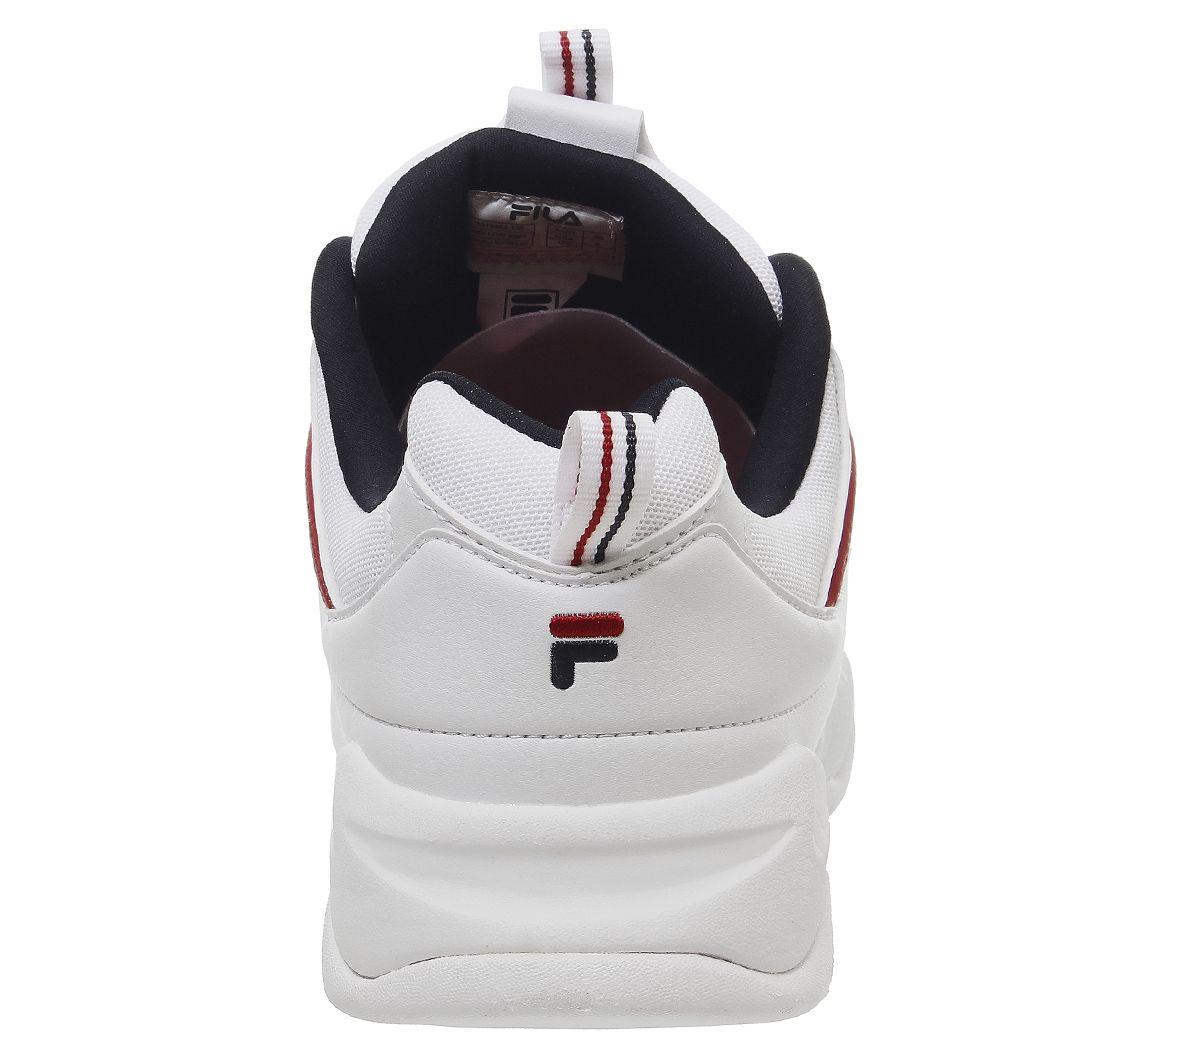 ebc0c02490e31 Womens Fila Fila Ray Trainers White Fila Navy Red Trainers Shoes